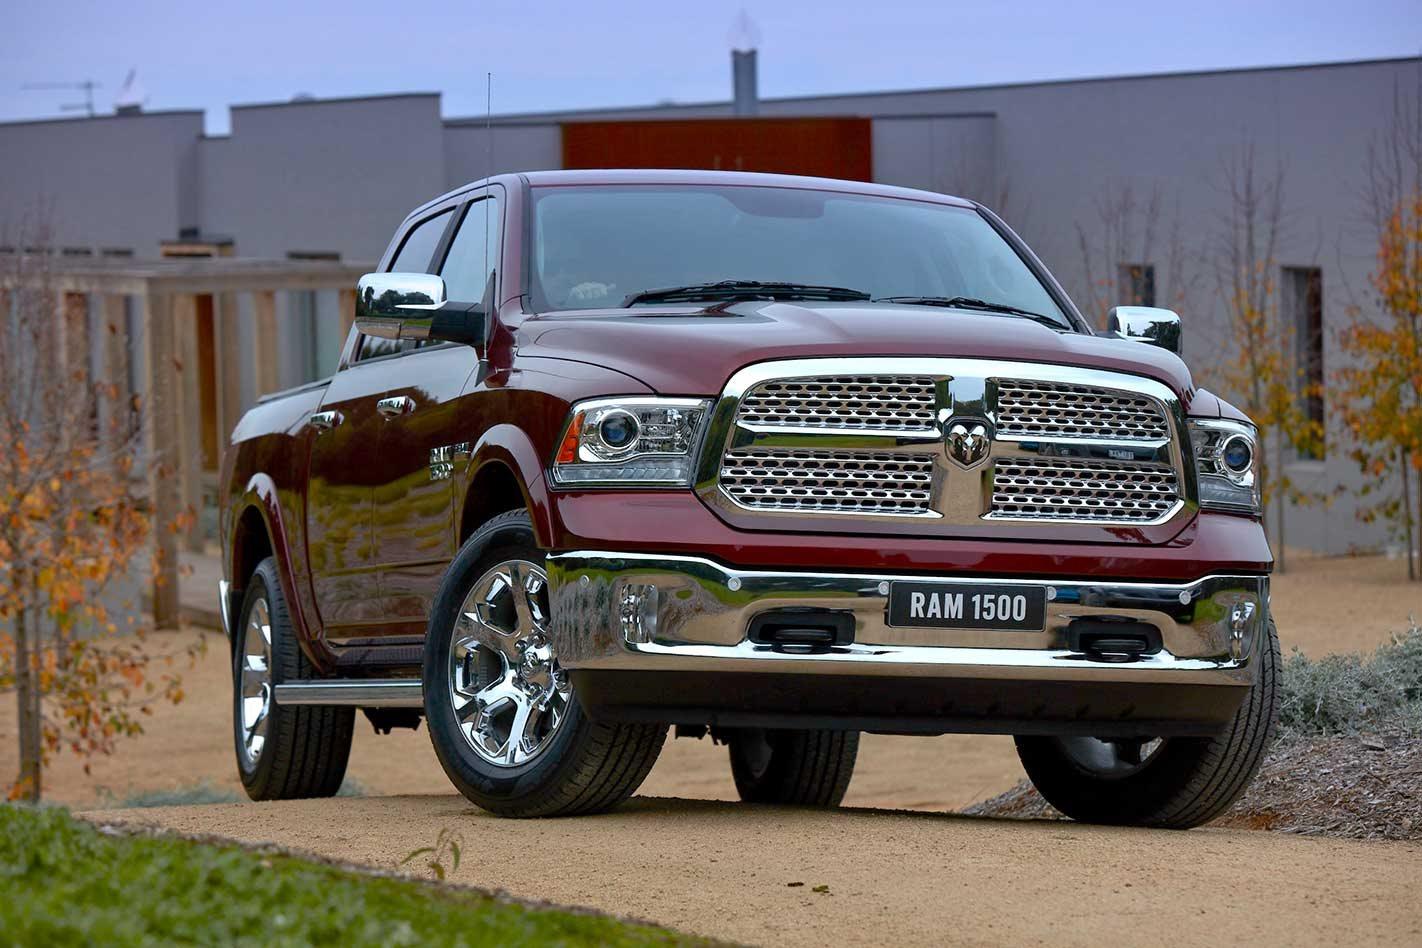 Ram 1500 Ecodiesel Arrives In Australia